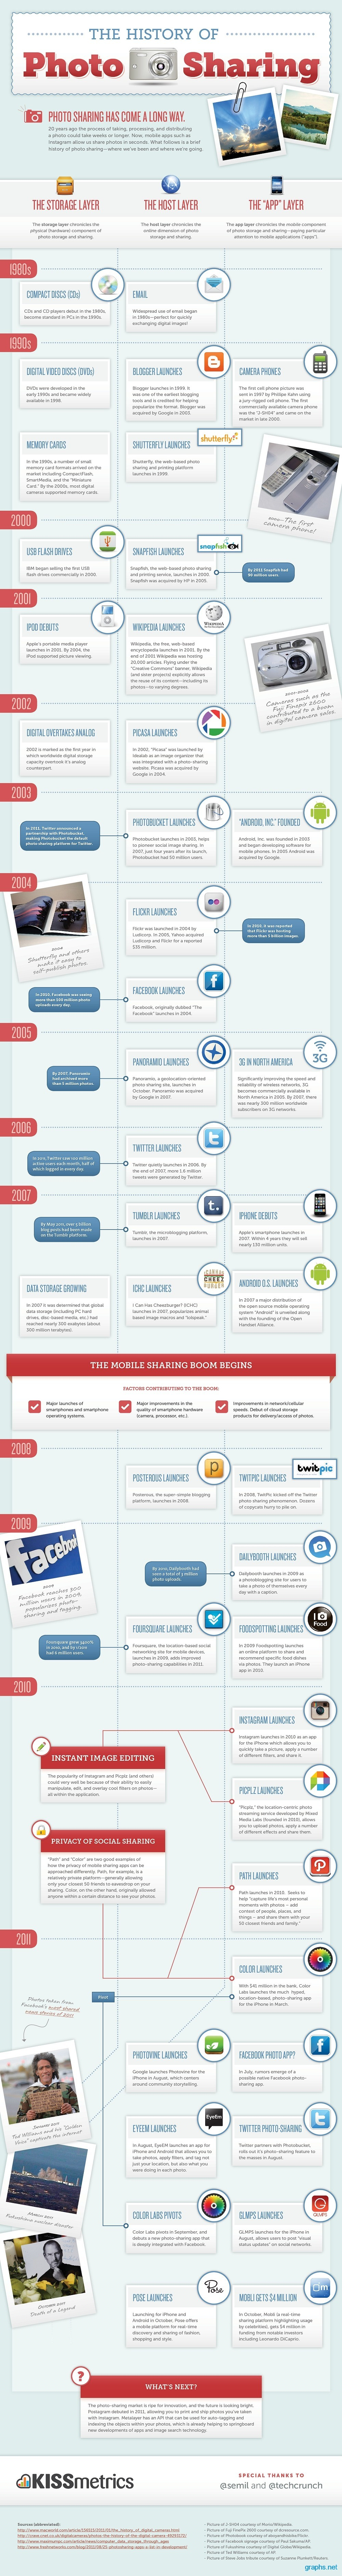 Evolution of Photo Sharing